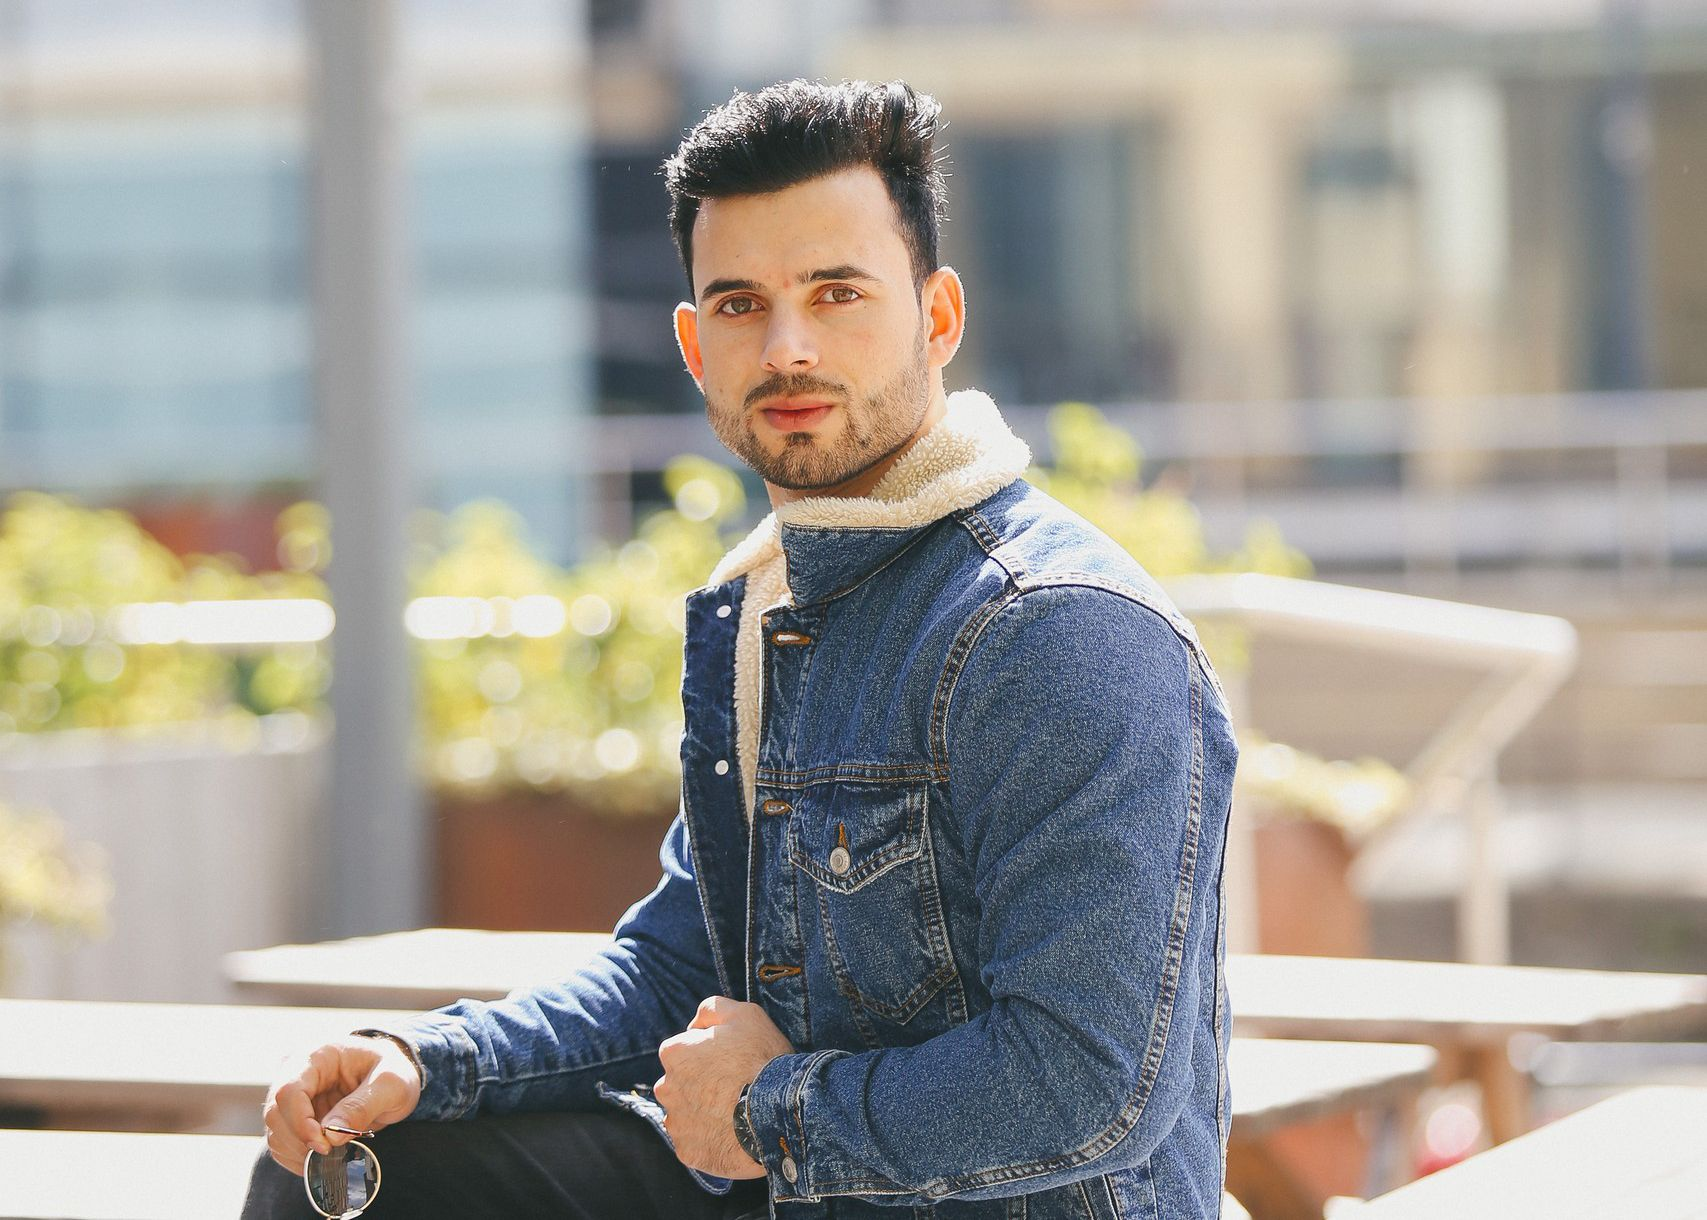 Profil Foto Dating Site Man)